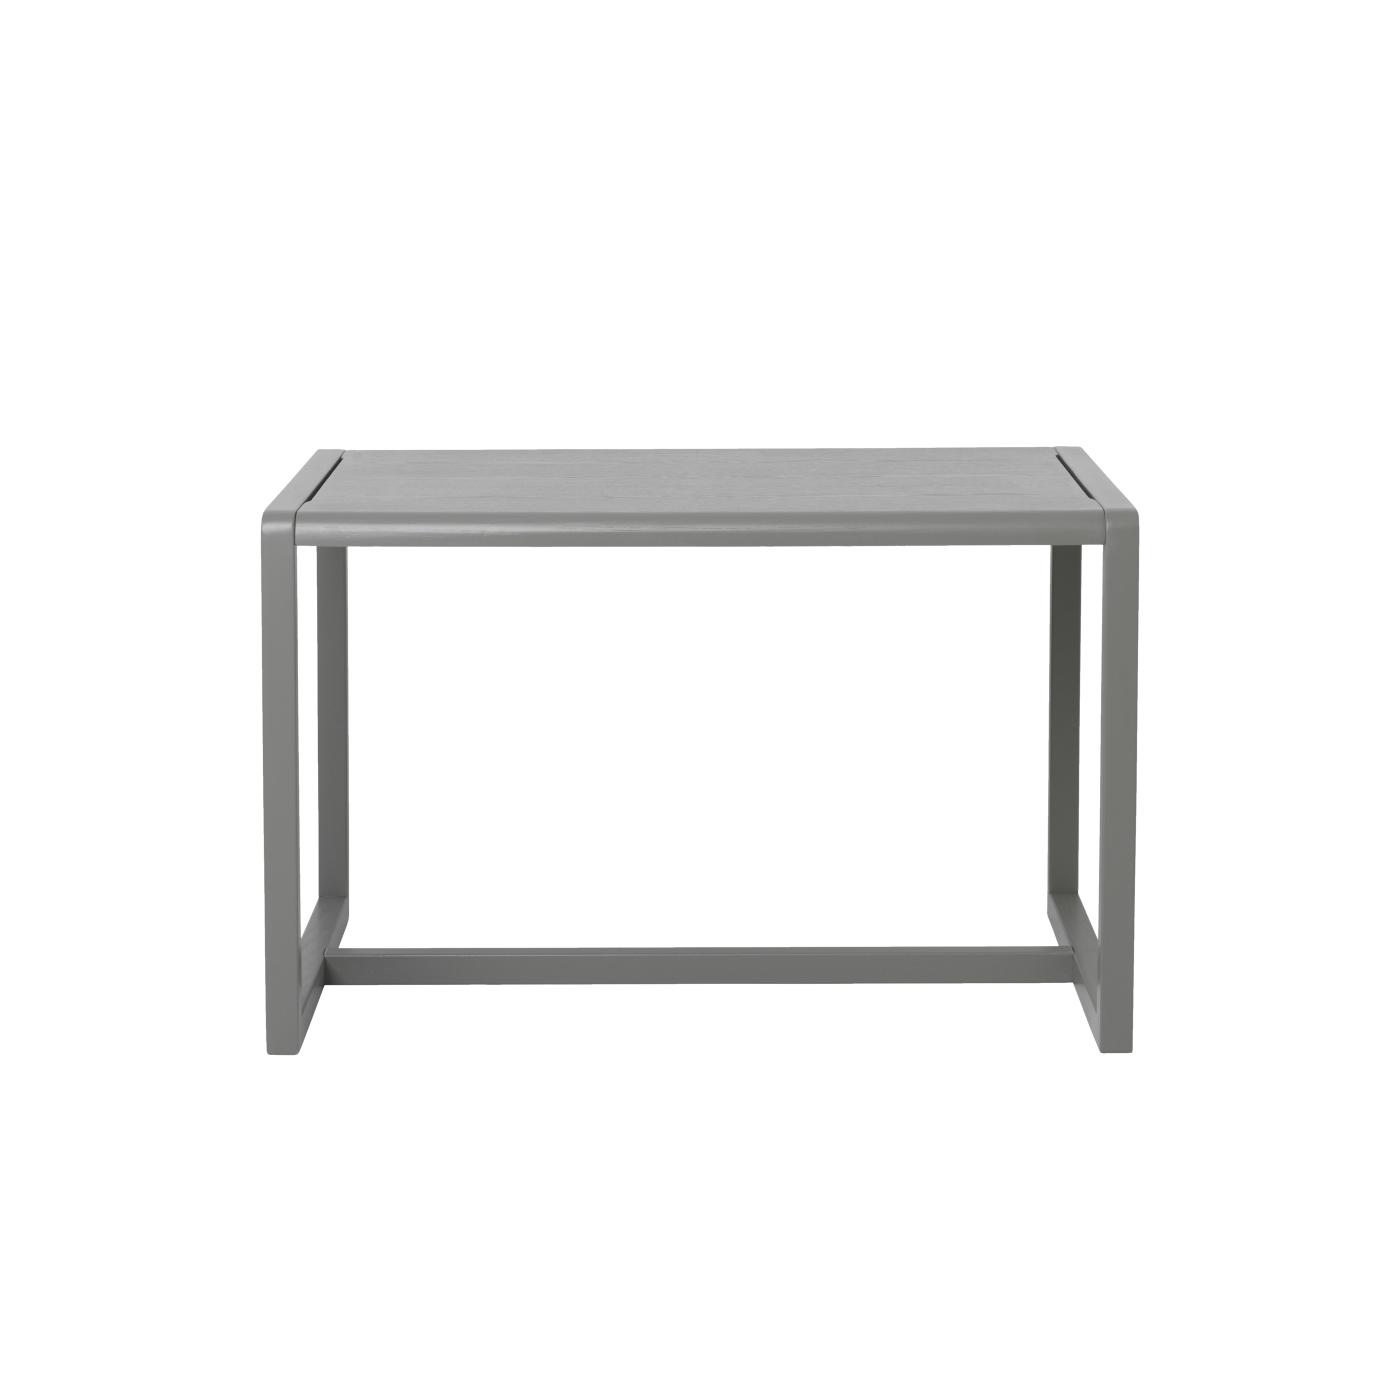 Little Architect barnbord- Grey, Ferm Living